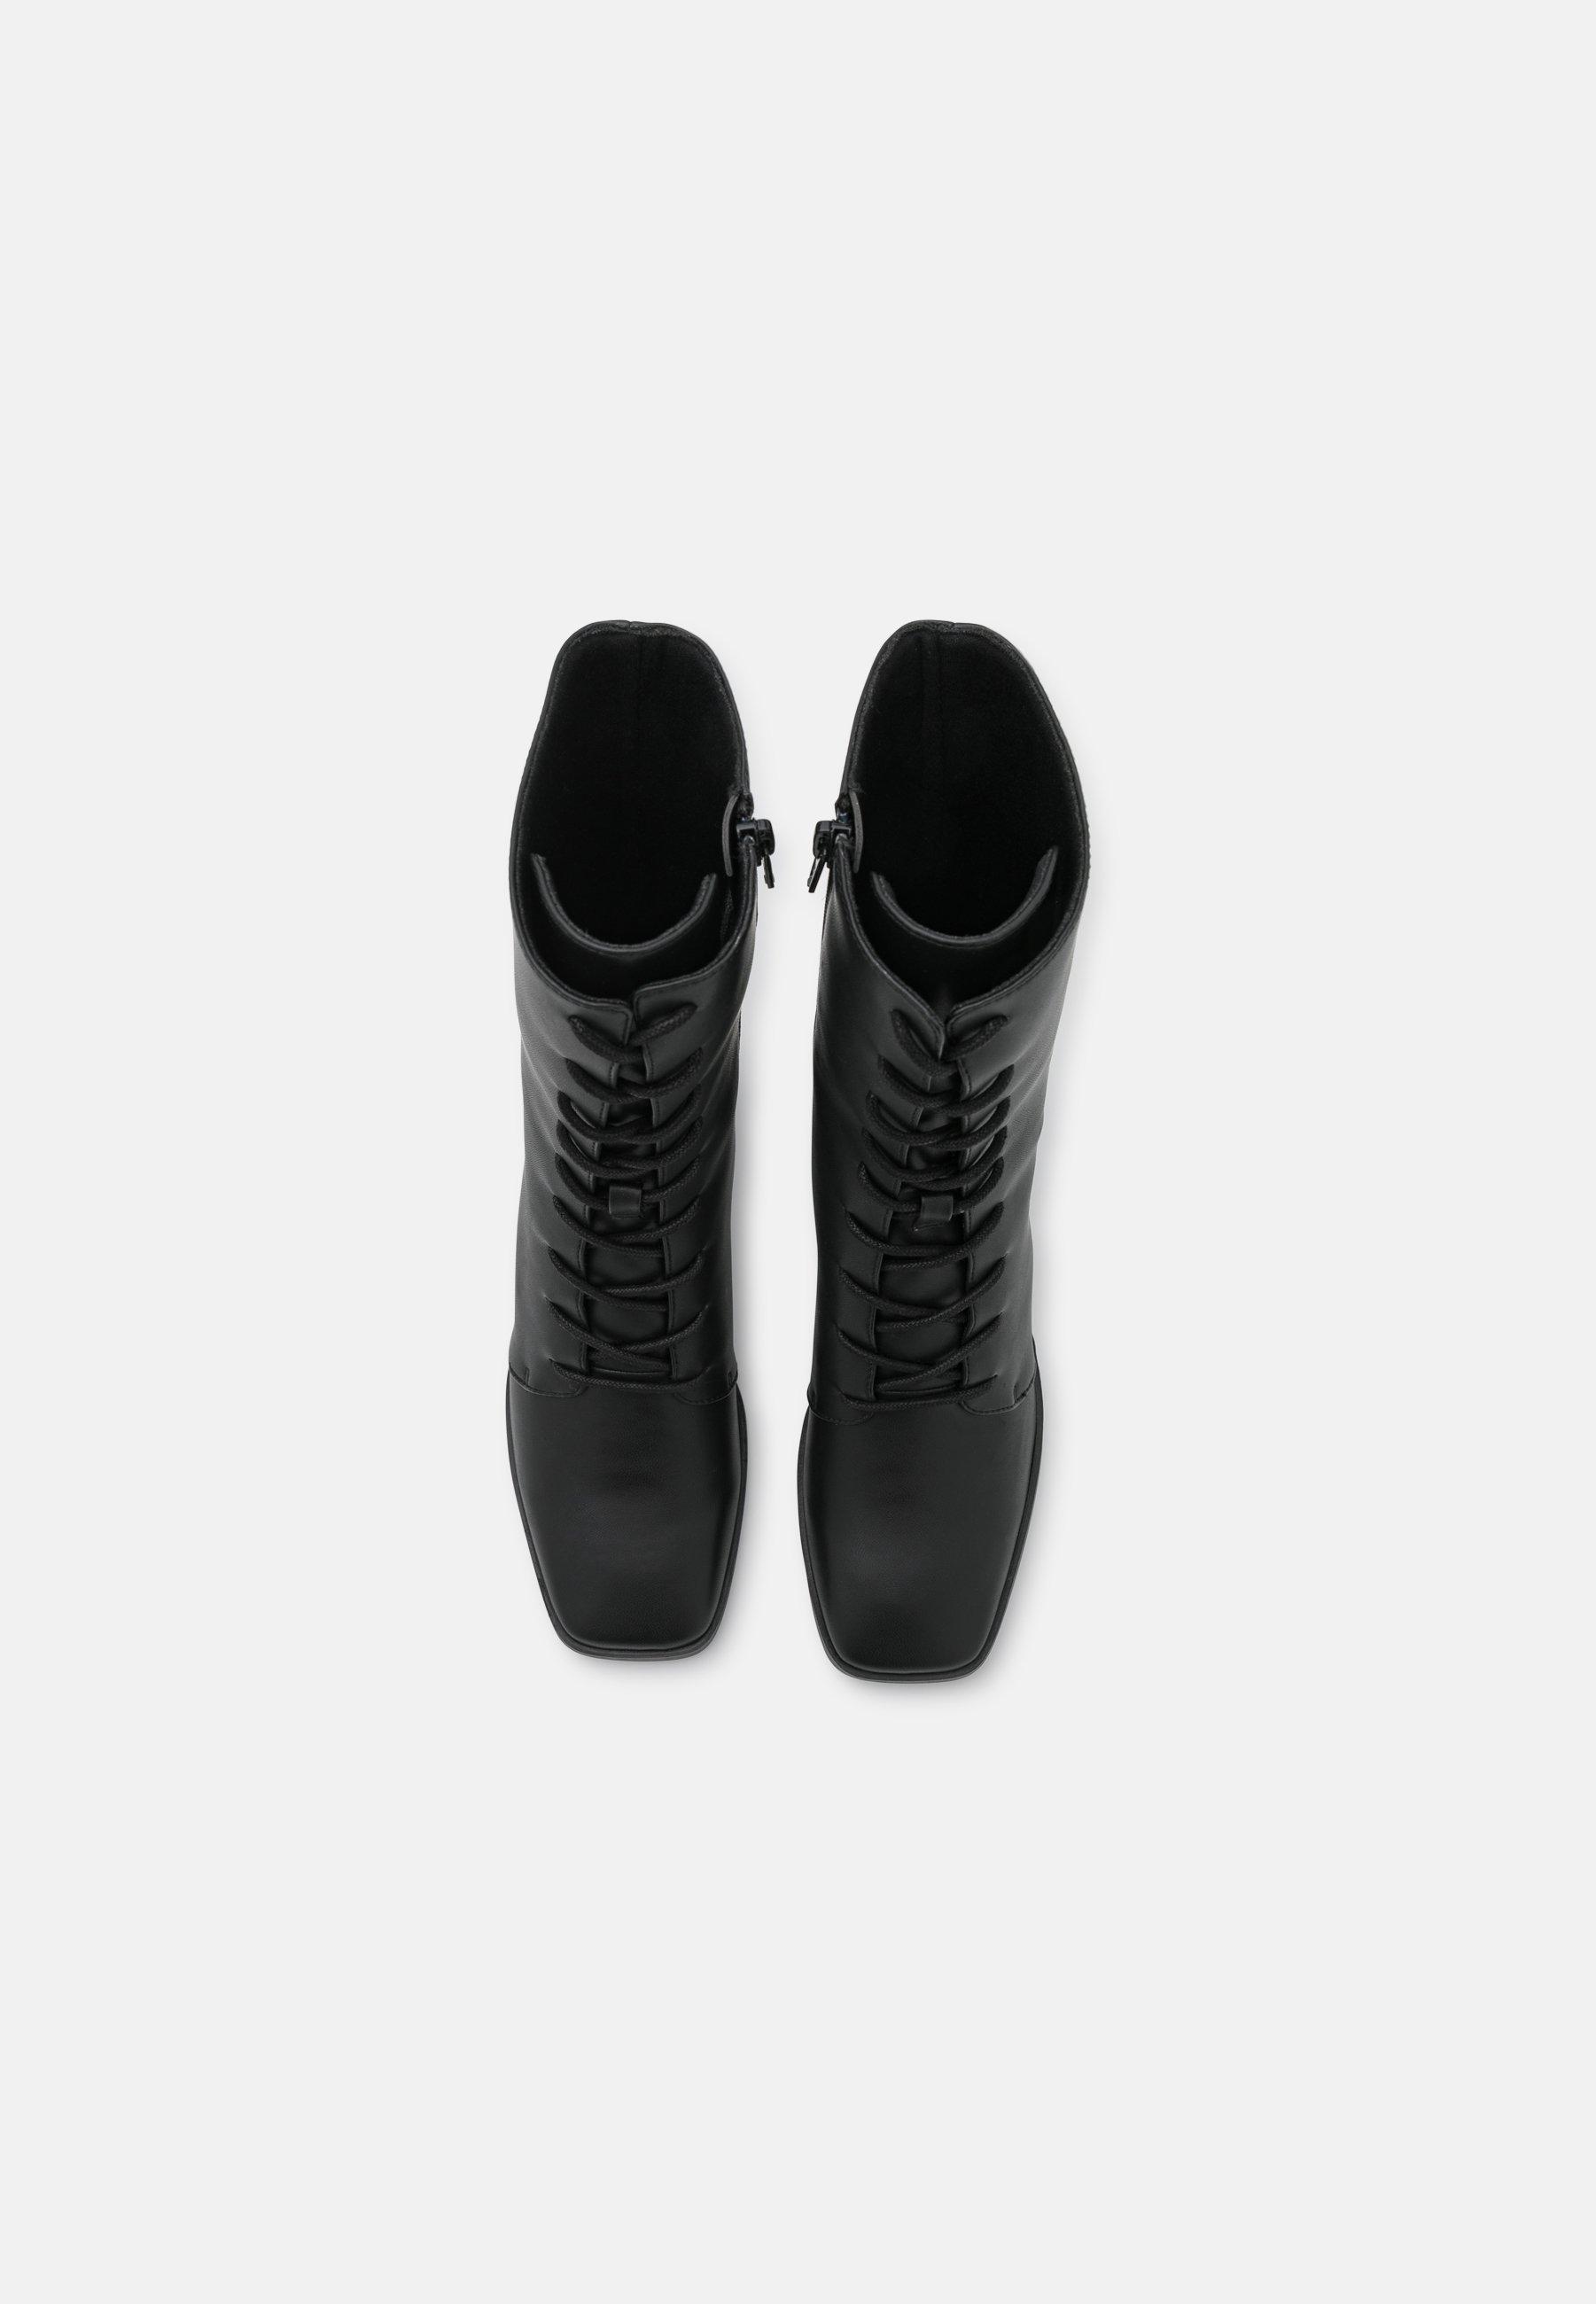 Femme ELMA BOOT VEGAN - Bottes à lacets - black dark